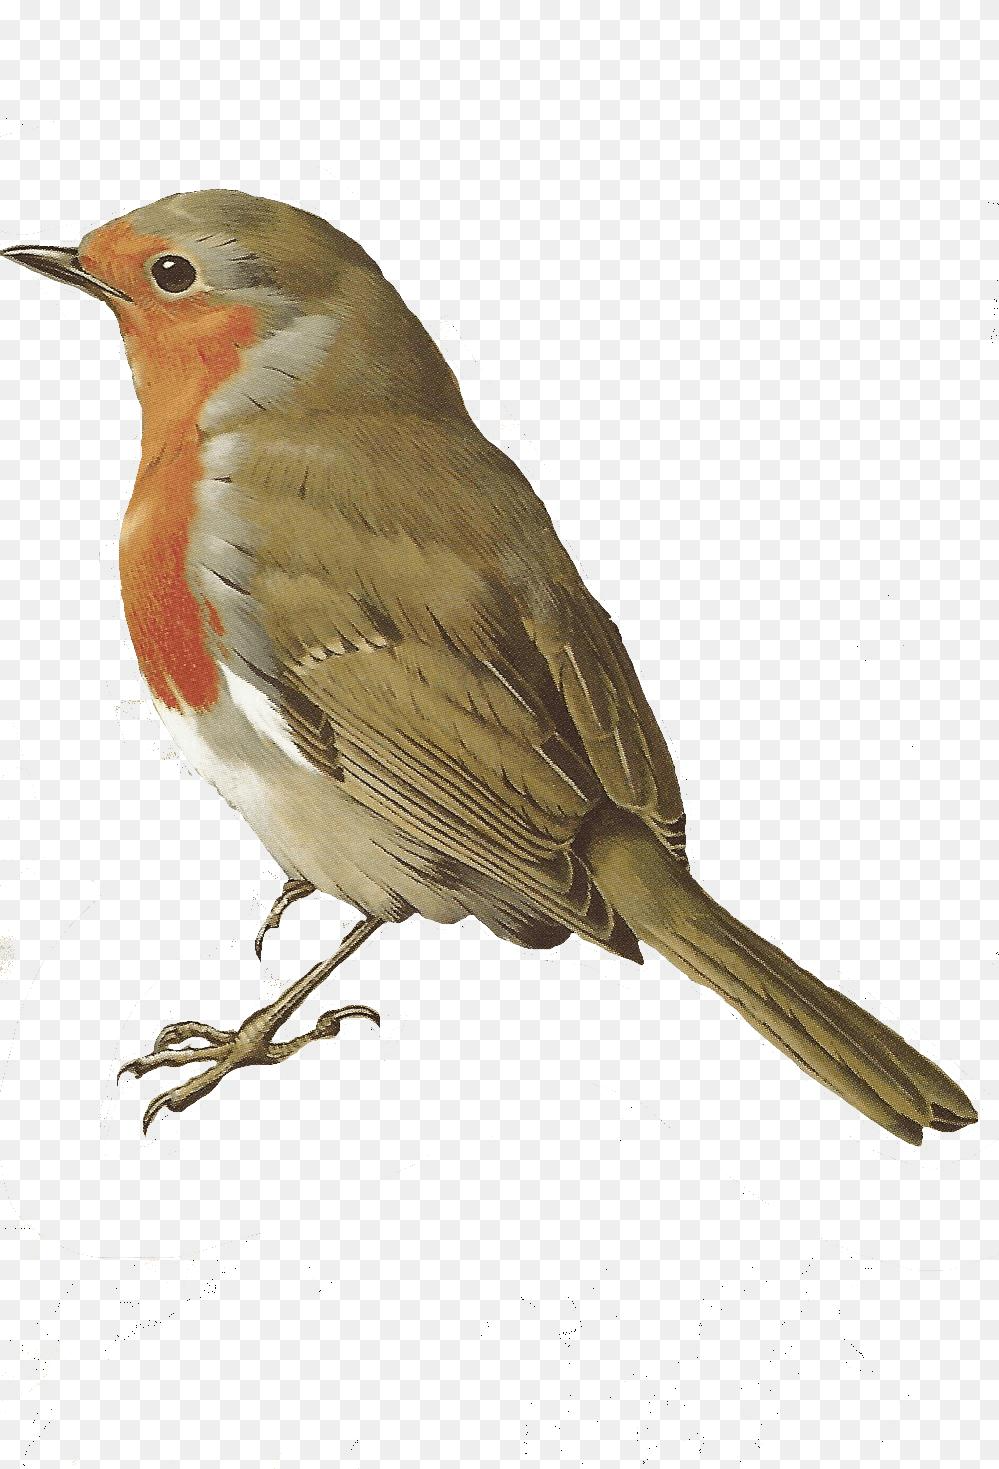 Free Bird Png Bird Png 999 1469 Png Download Free Transparent Background Free Bird Png Png Download Birds Painting Bird Printables Vintage Birds